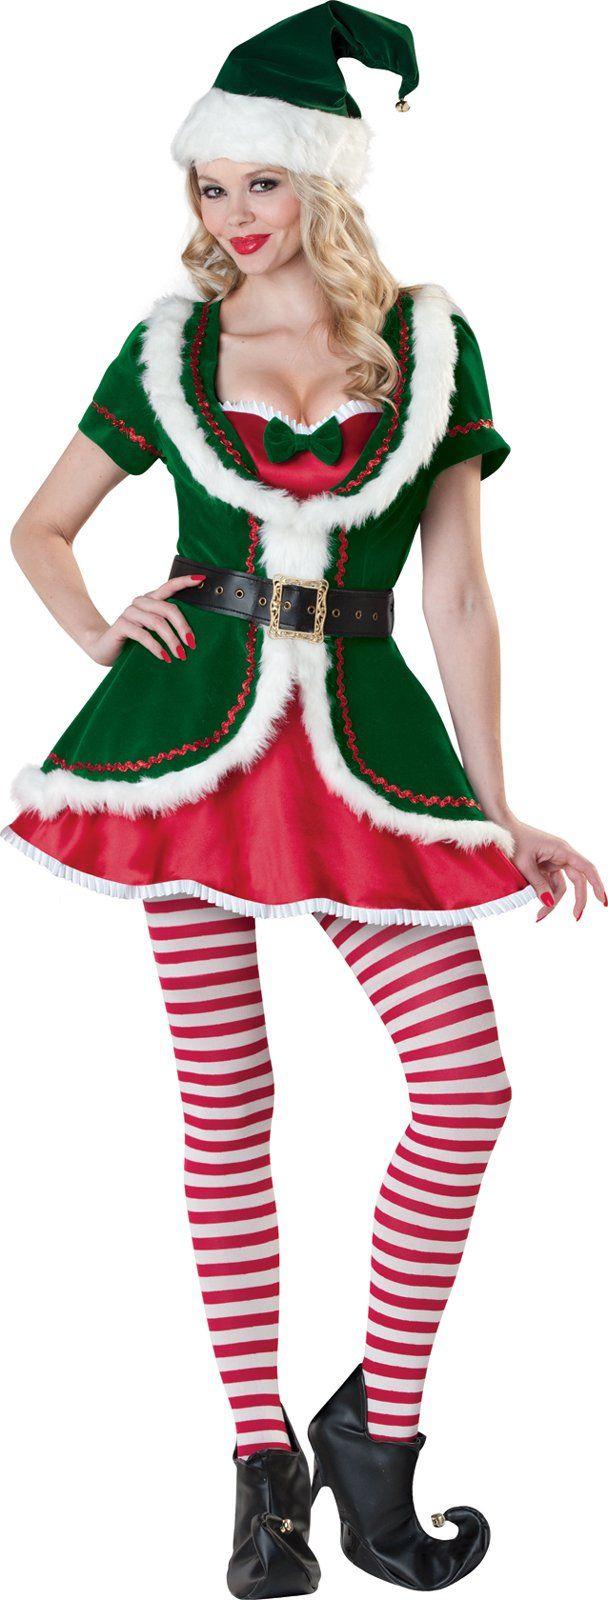 23 best Santa Claus Costumes images on Pinterest